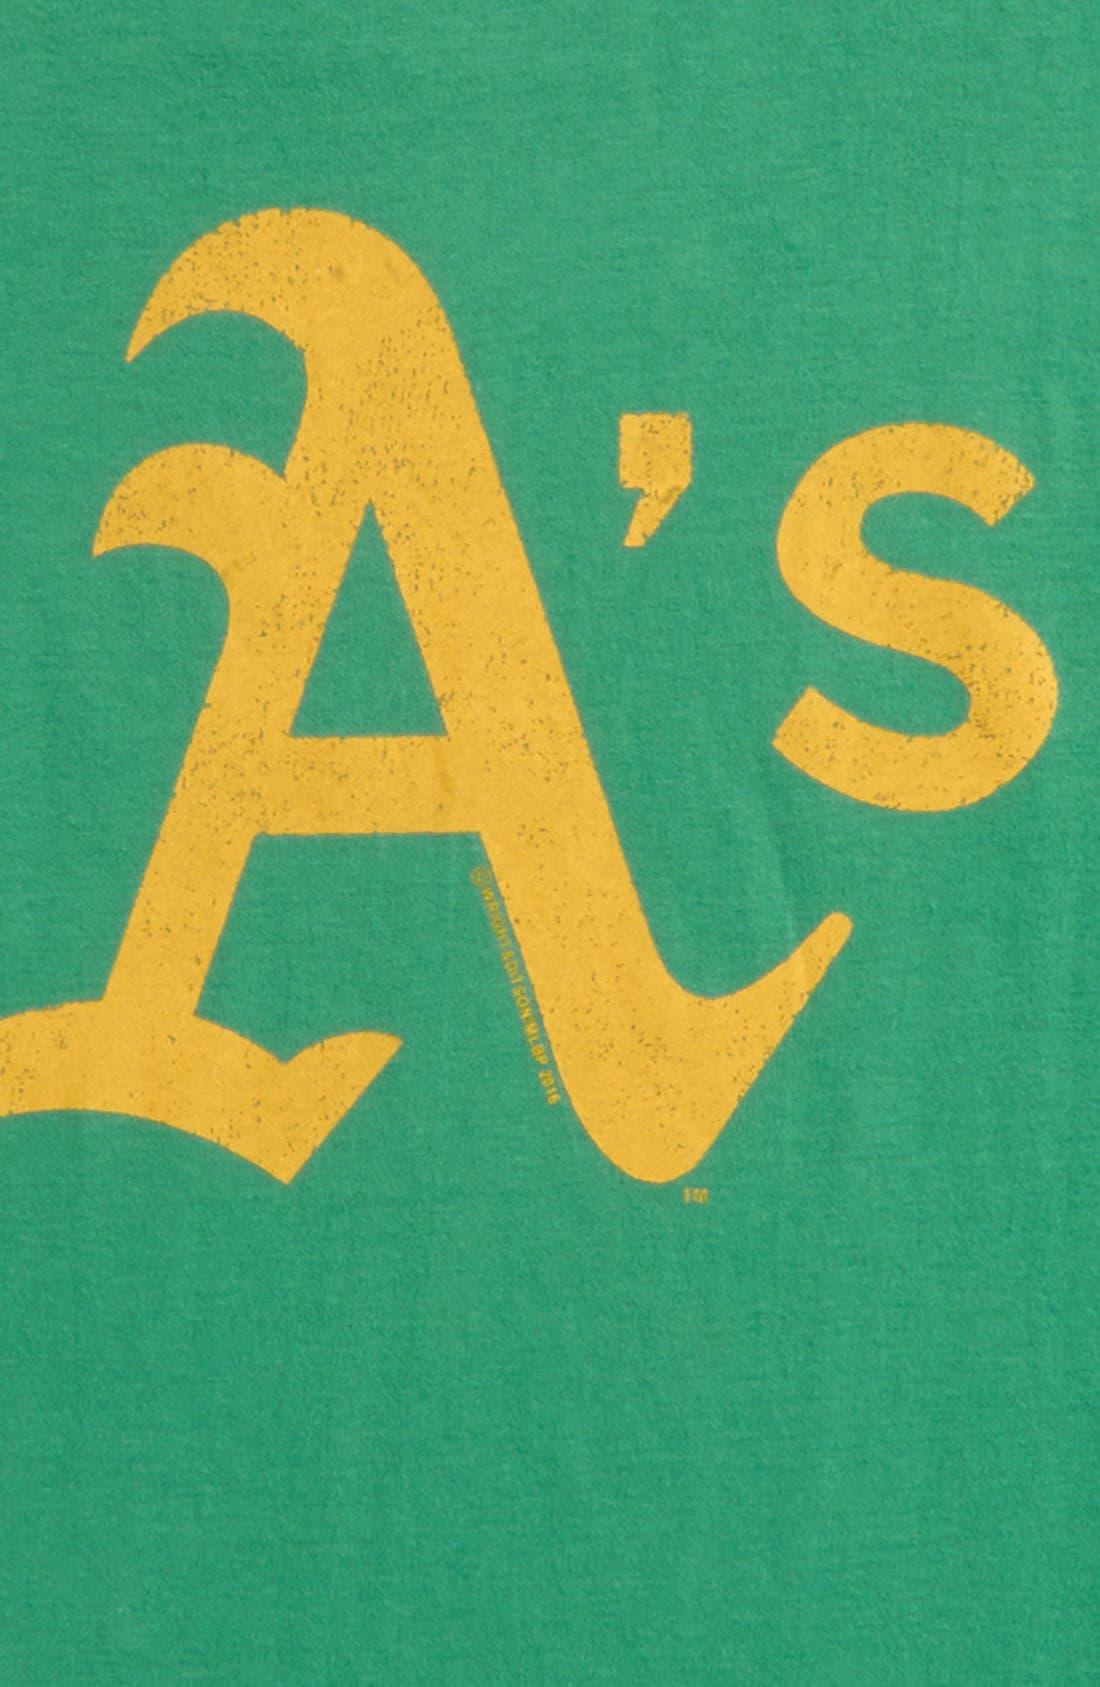 'Oakland Athletics' T-Shirt,                             Alternate thumbnail 2, color,                             300